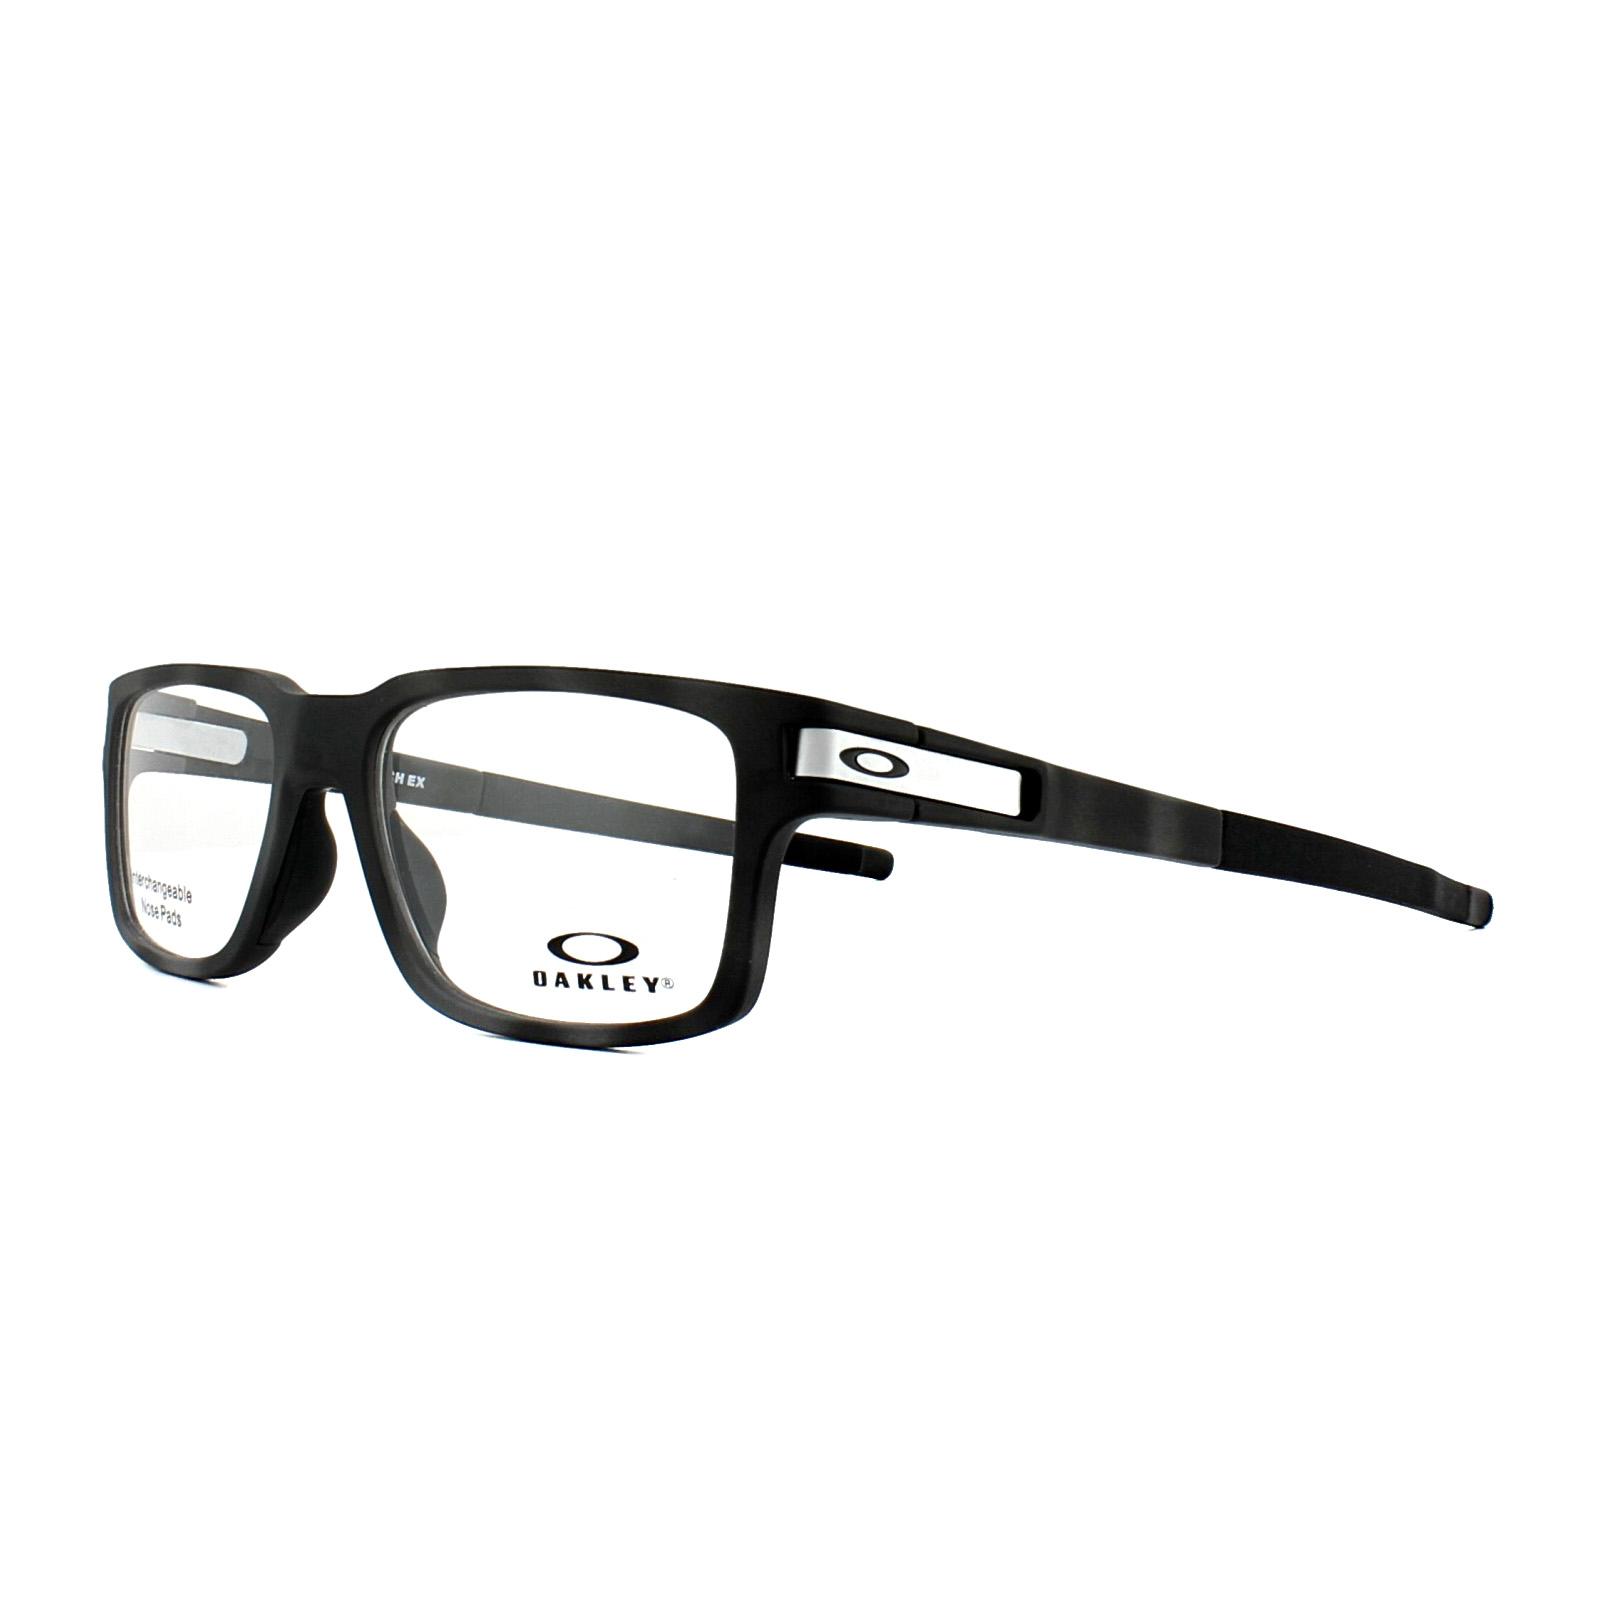 Oakley Glasses Frames Latch EX OX8115-05 Black Camo 52mm Mens ...